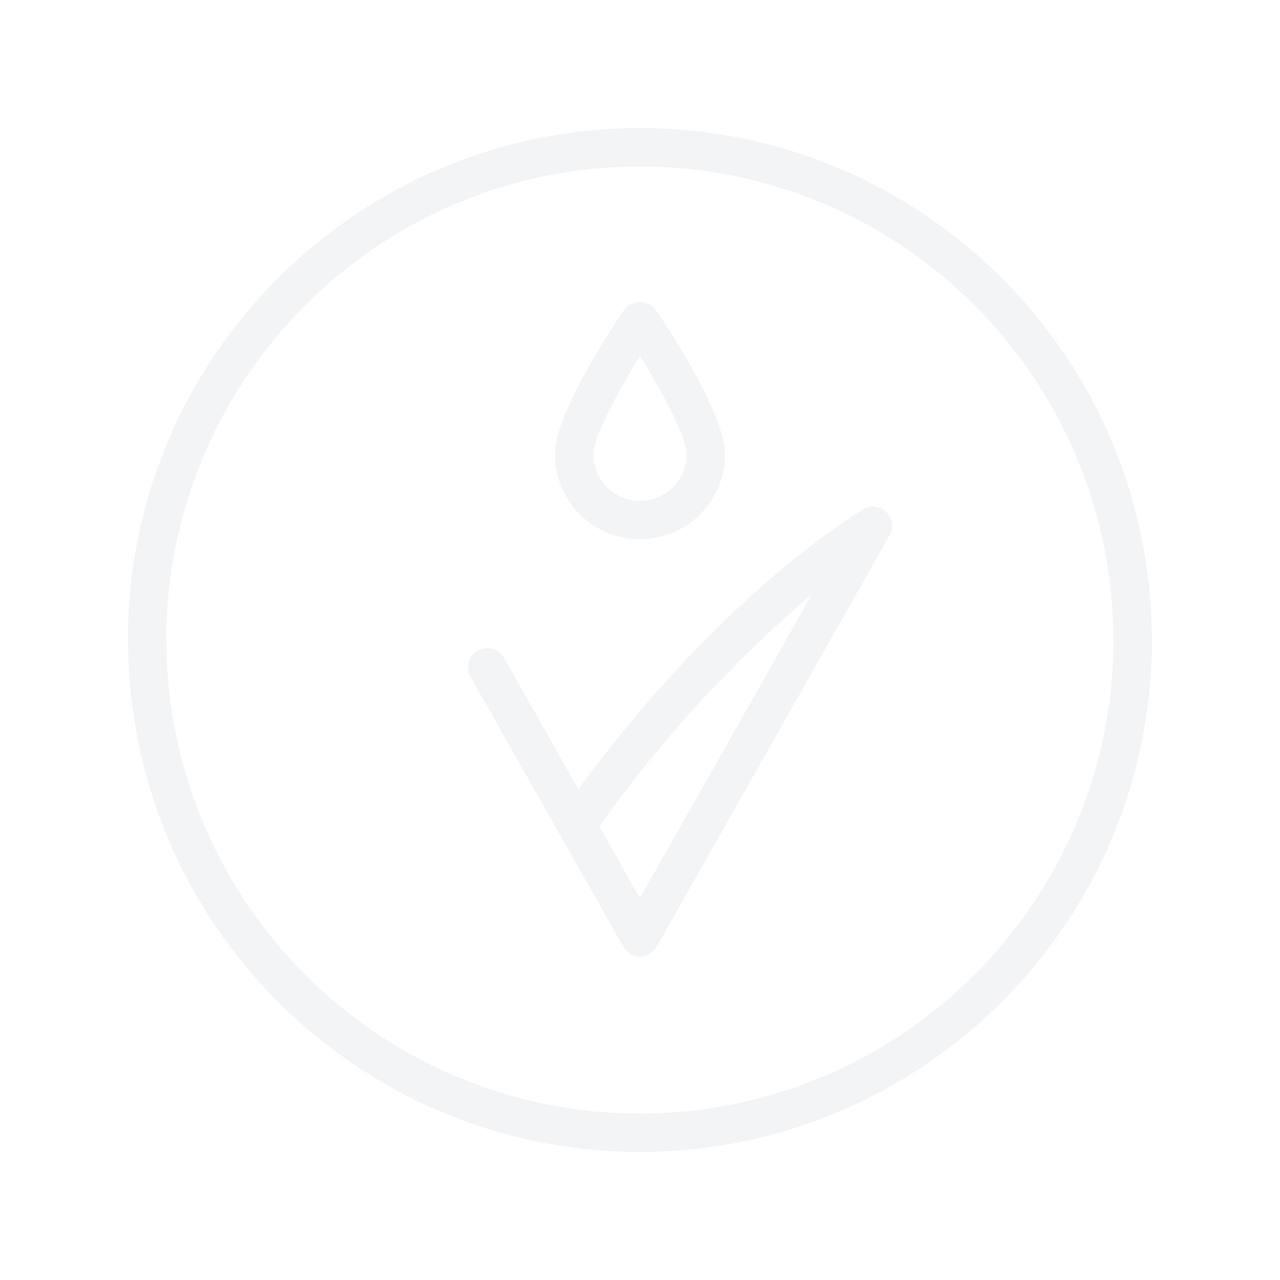 ALESSANDRO Nail Polish No.102 Moonlight Kiss 5ml